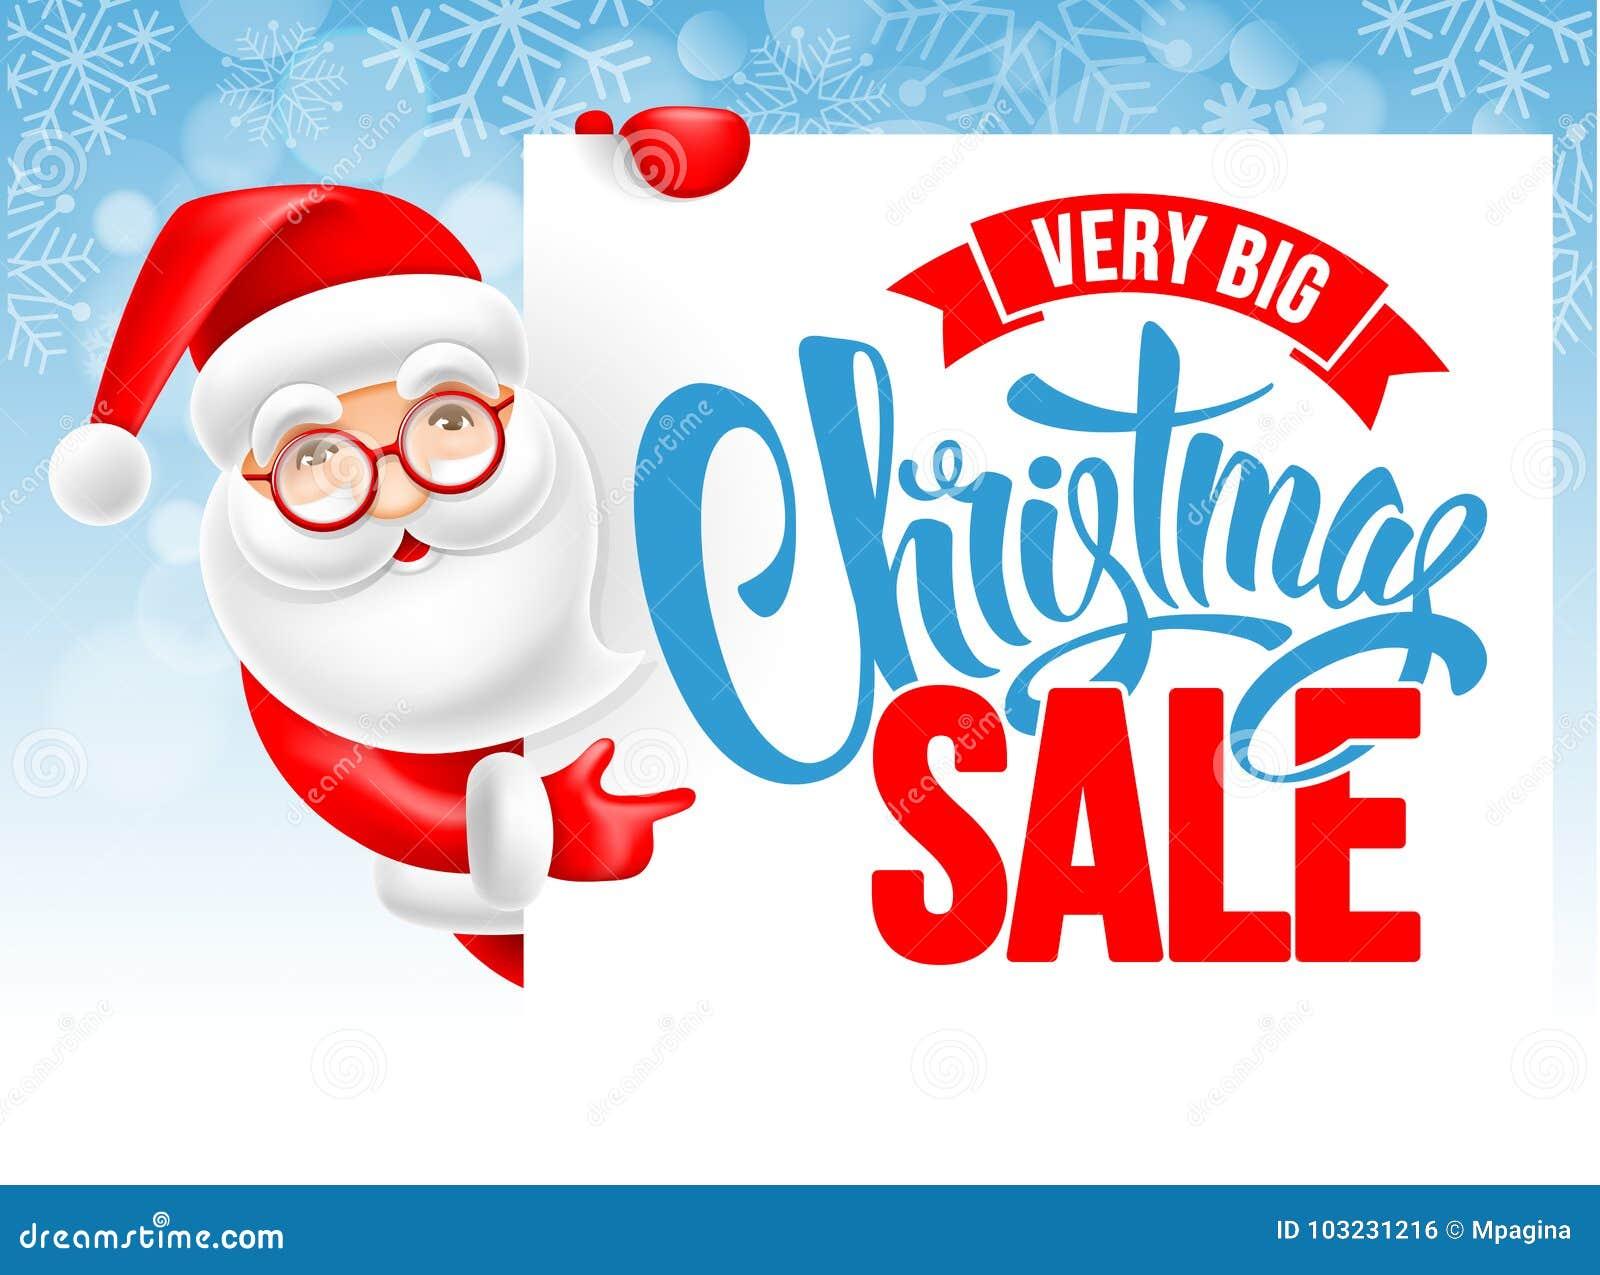 de52d2a58c Cheerful cartoon Santa Claus and Christmas sale advertising poster. Vector  illustration.